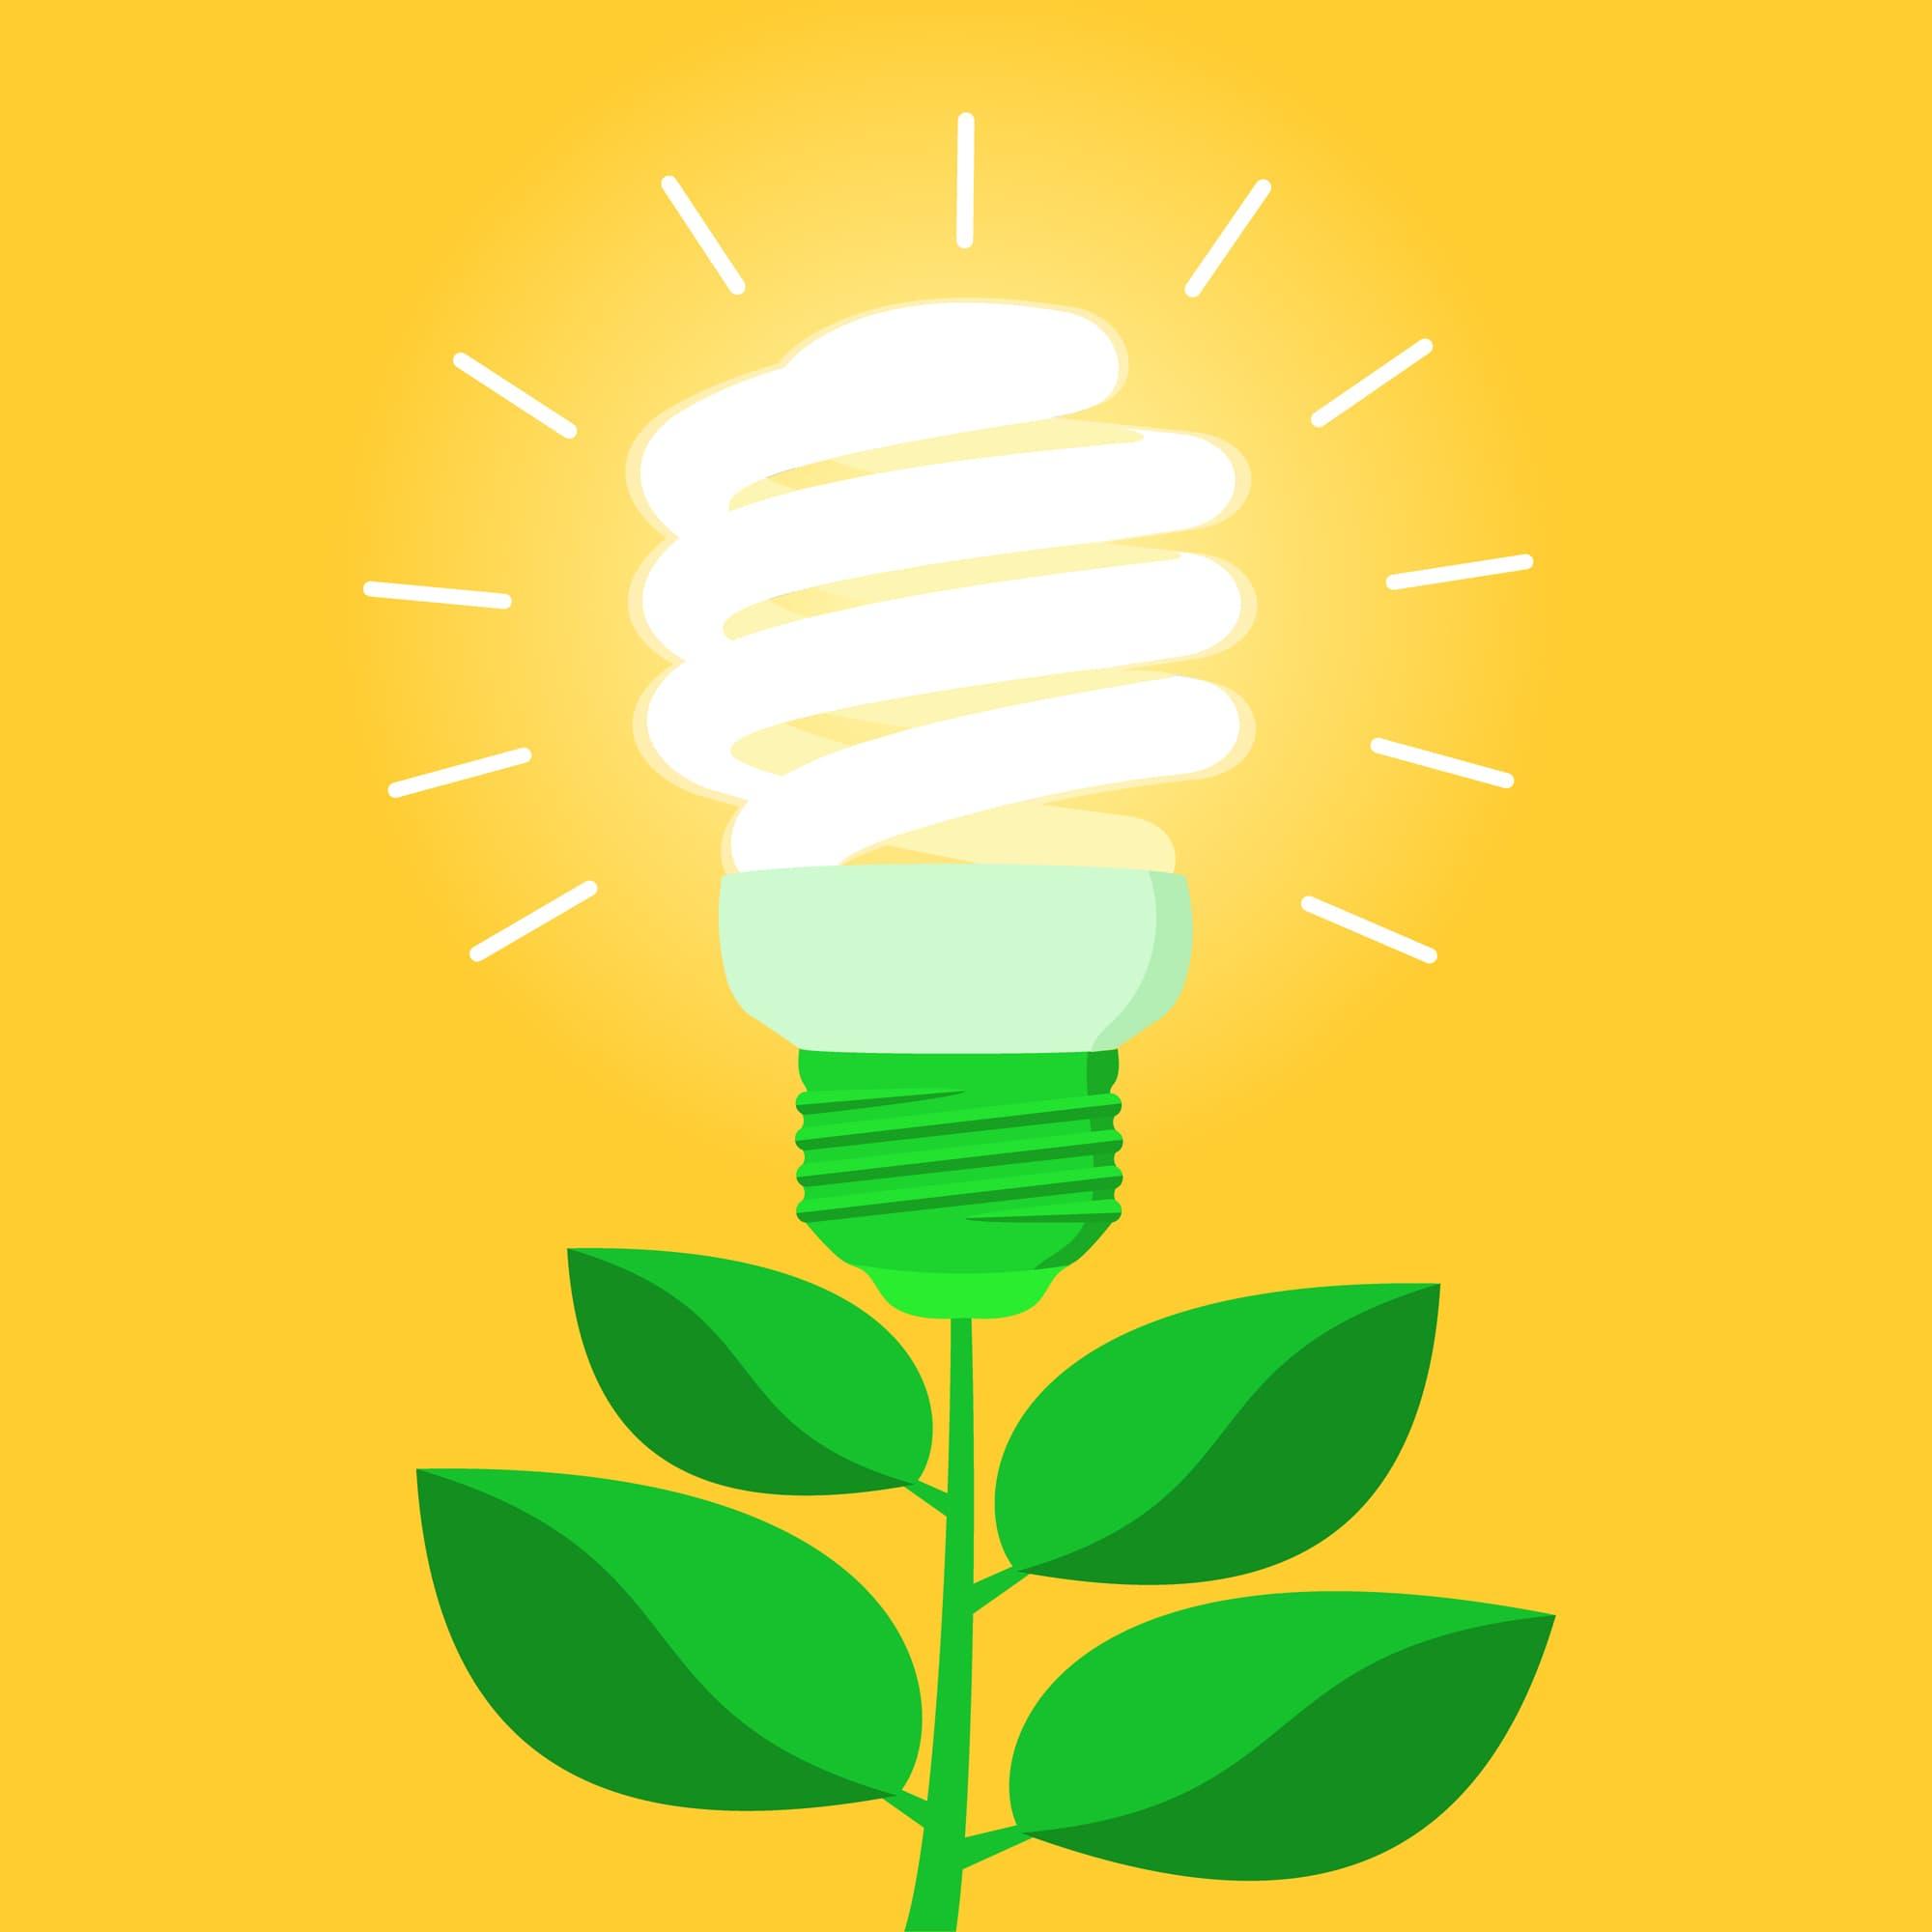 Efficienza energetica: fattore resilienza